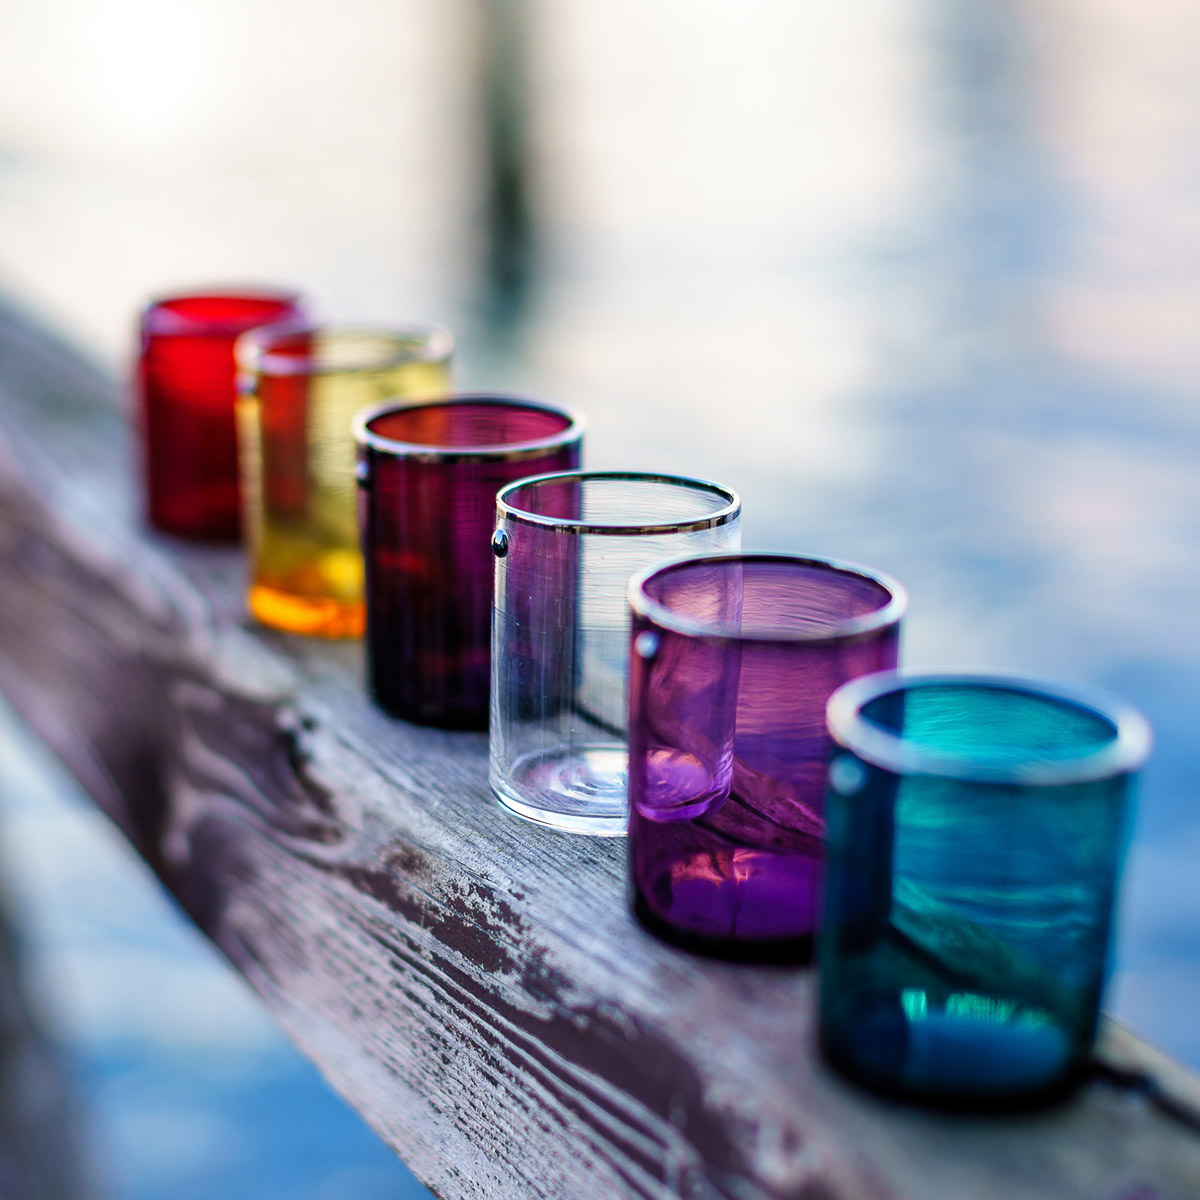 jai-glass-murano-detail-vodka-venice-platinum-crystal-giberto-design